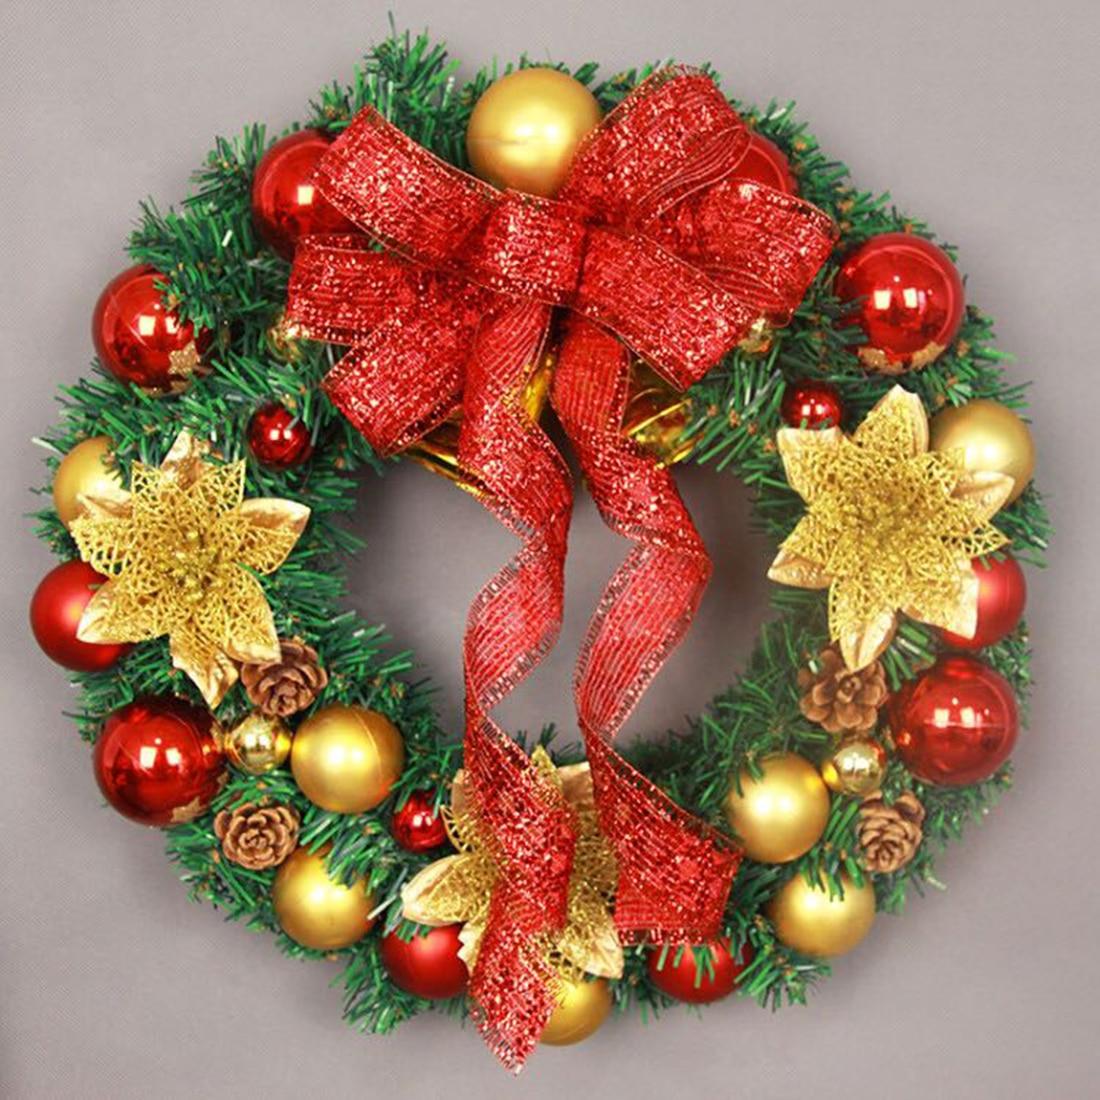 Christmas Decorations Luxury